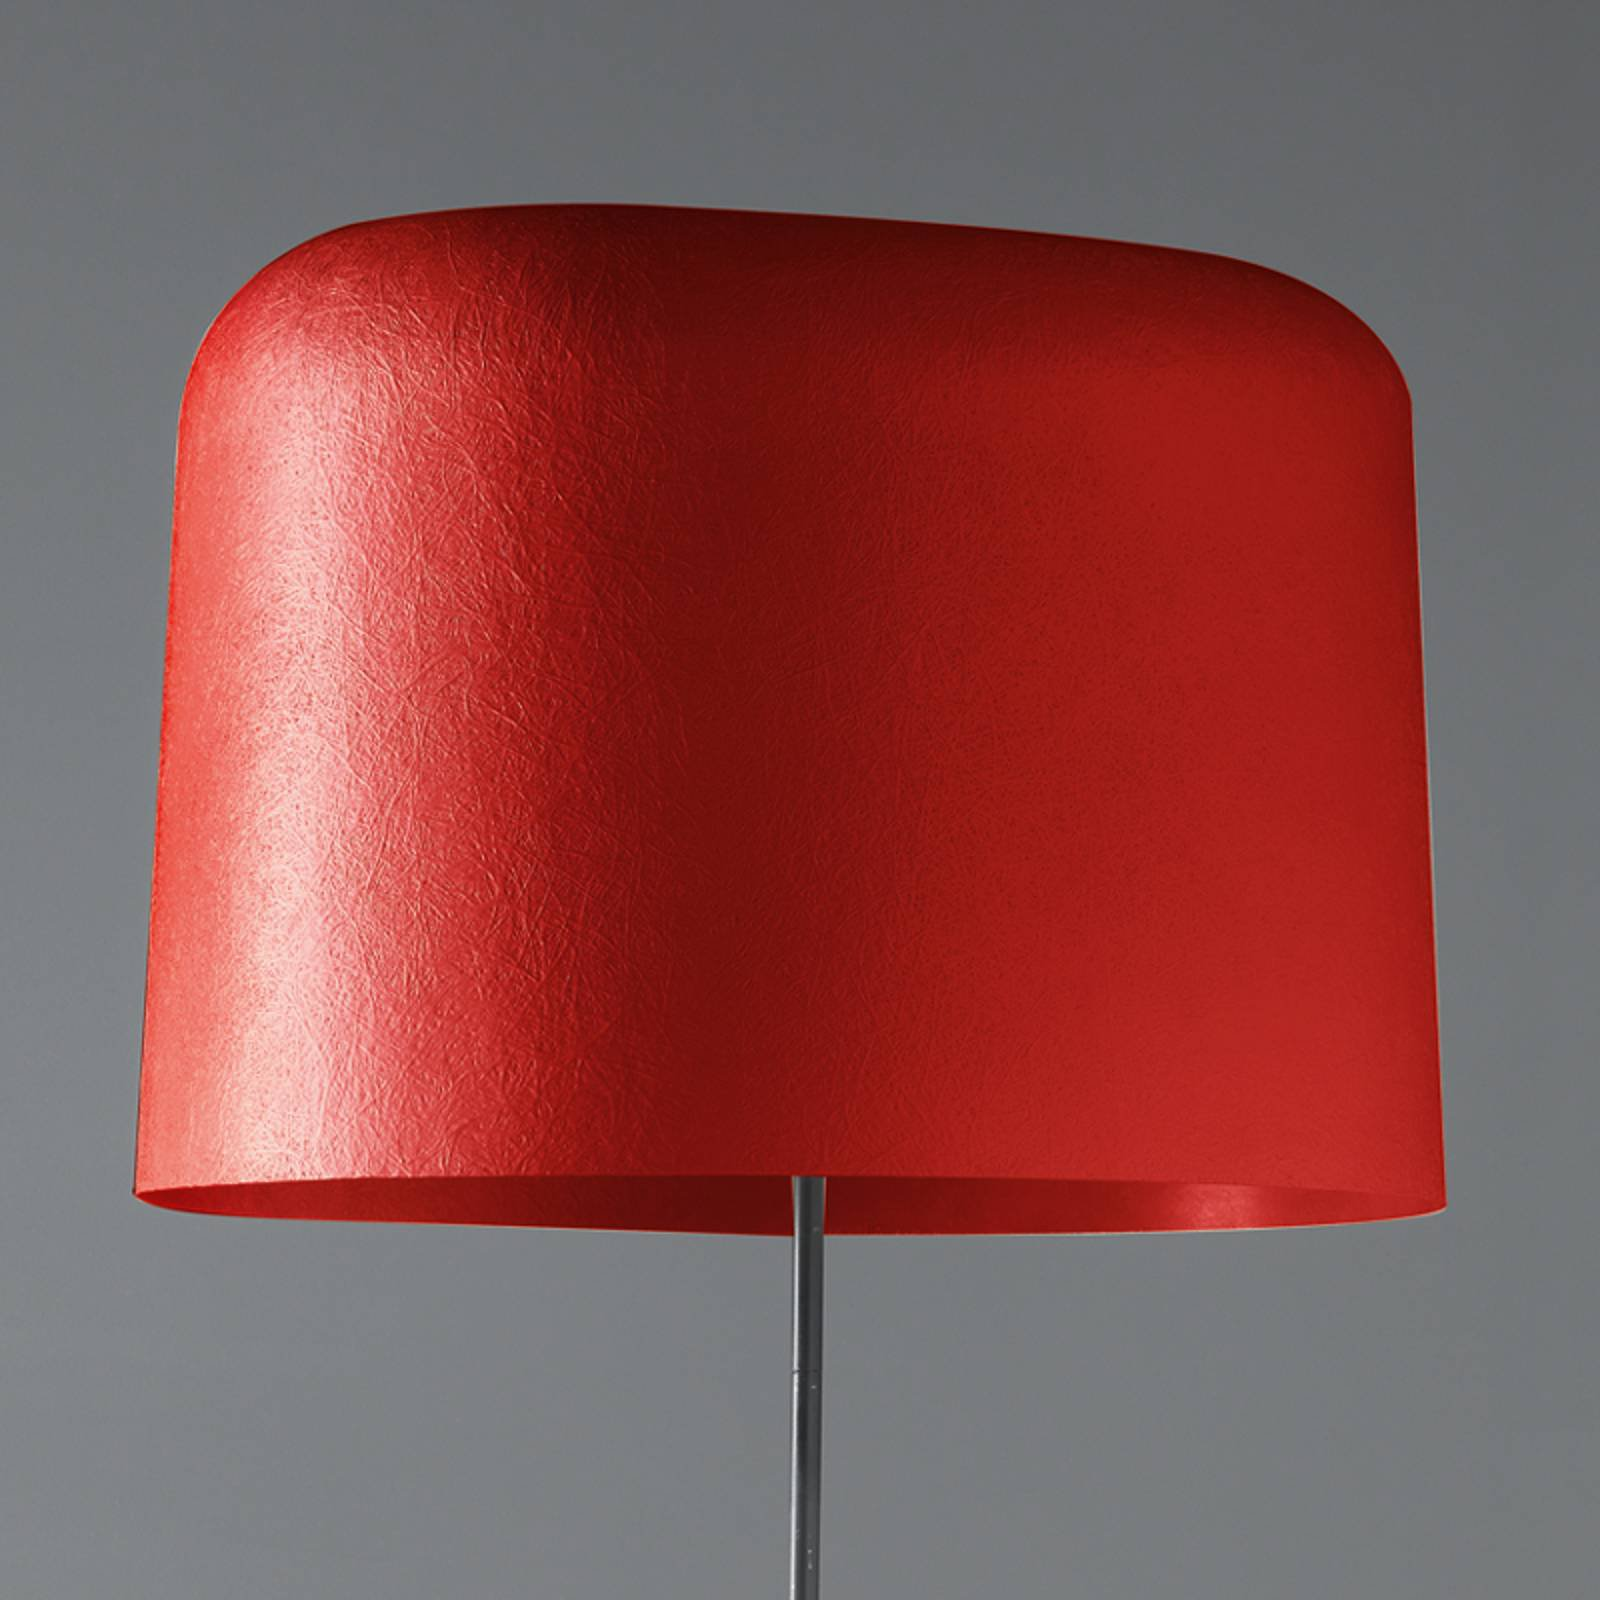 Med dimmer - stålampe Ola rød